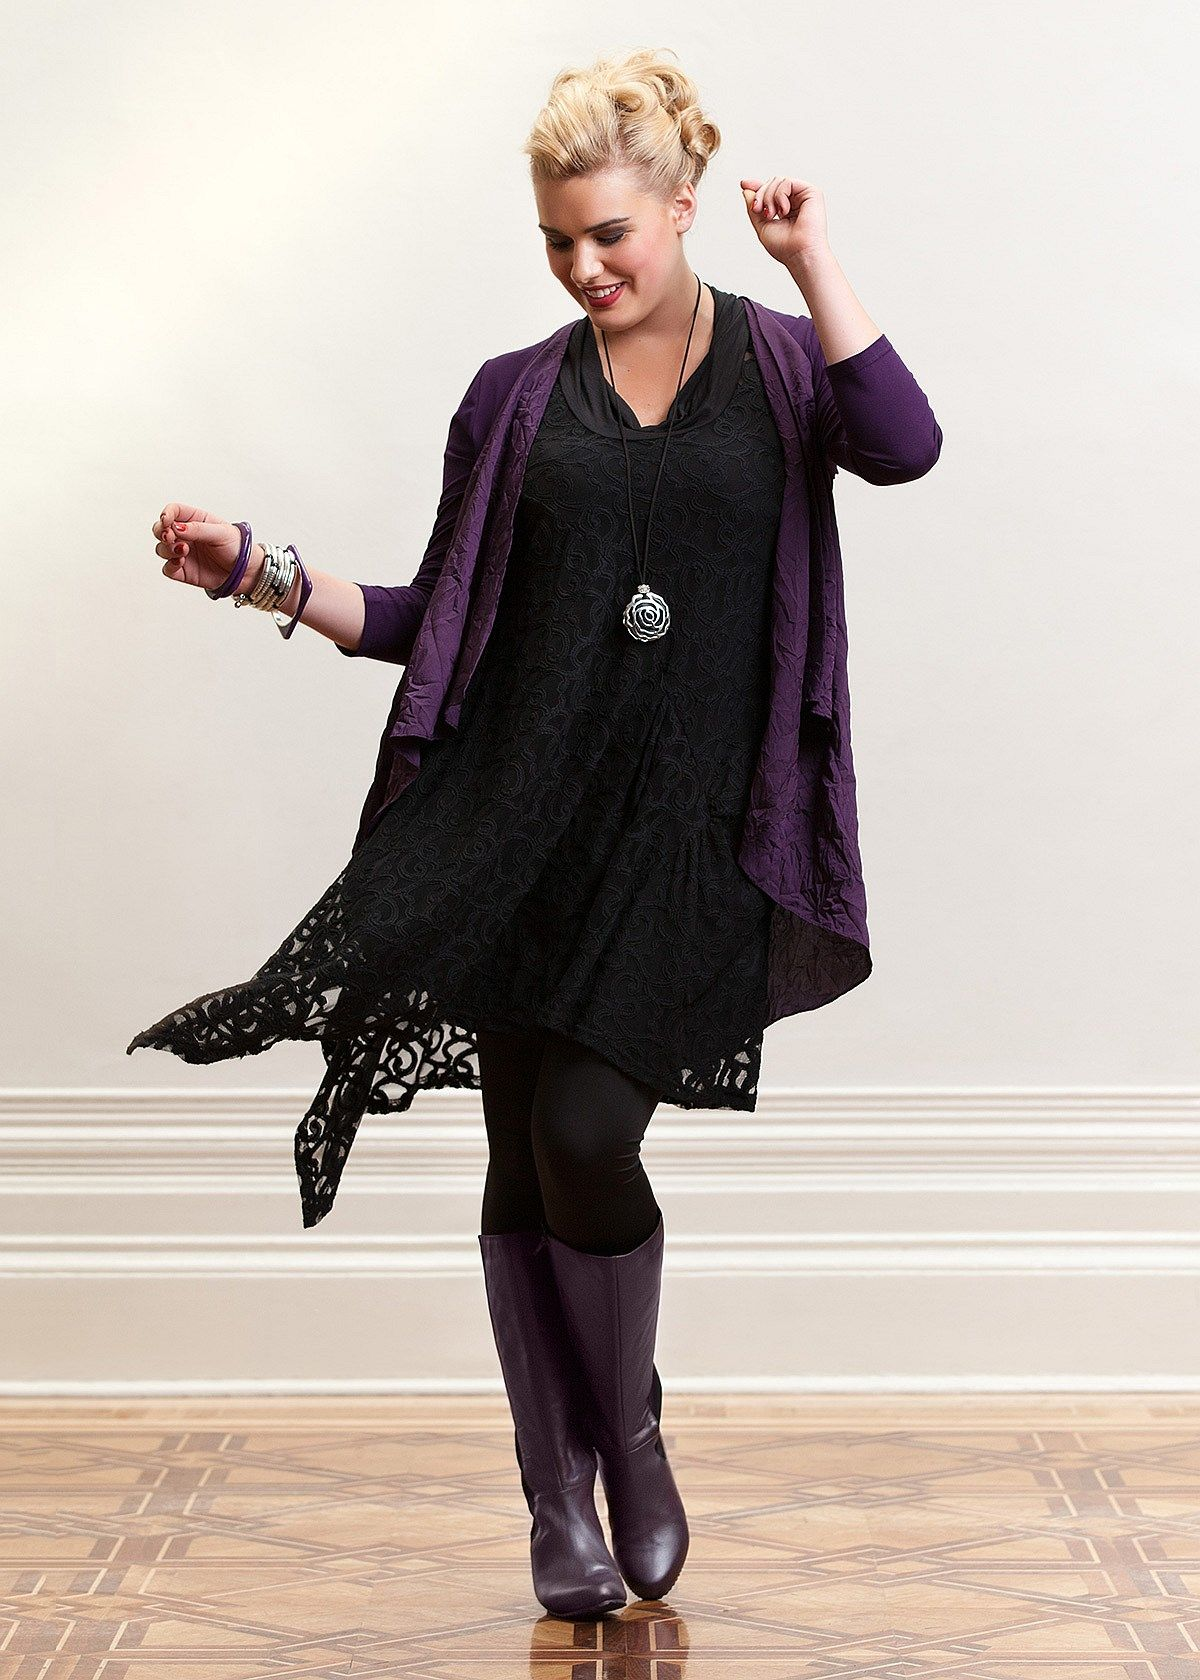 Stylish Plus Size Evening Wear for Women   KORE WAVE CARDY   TS20 ...